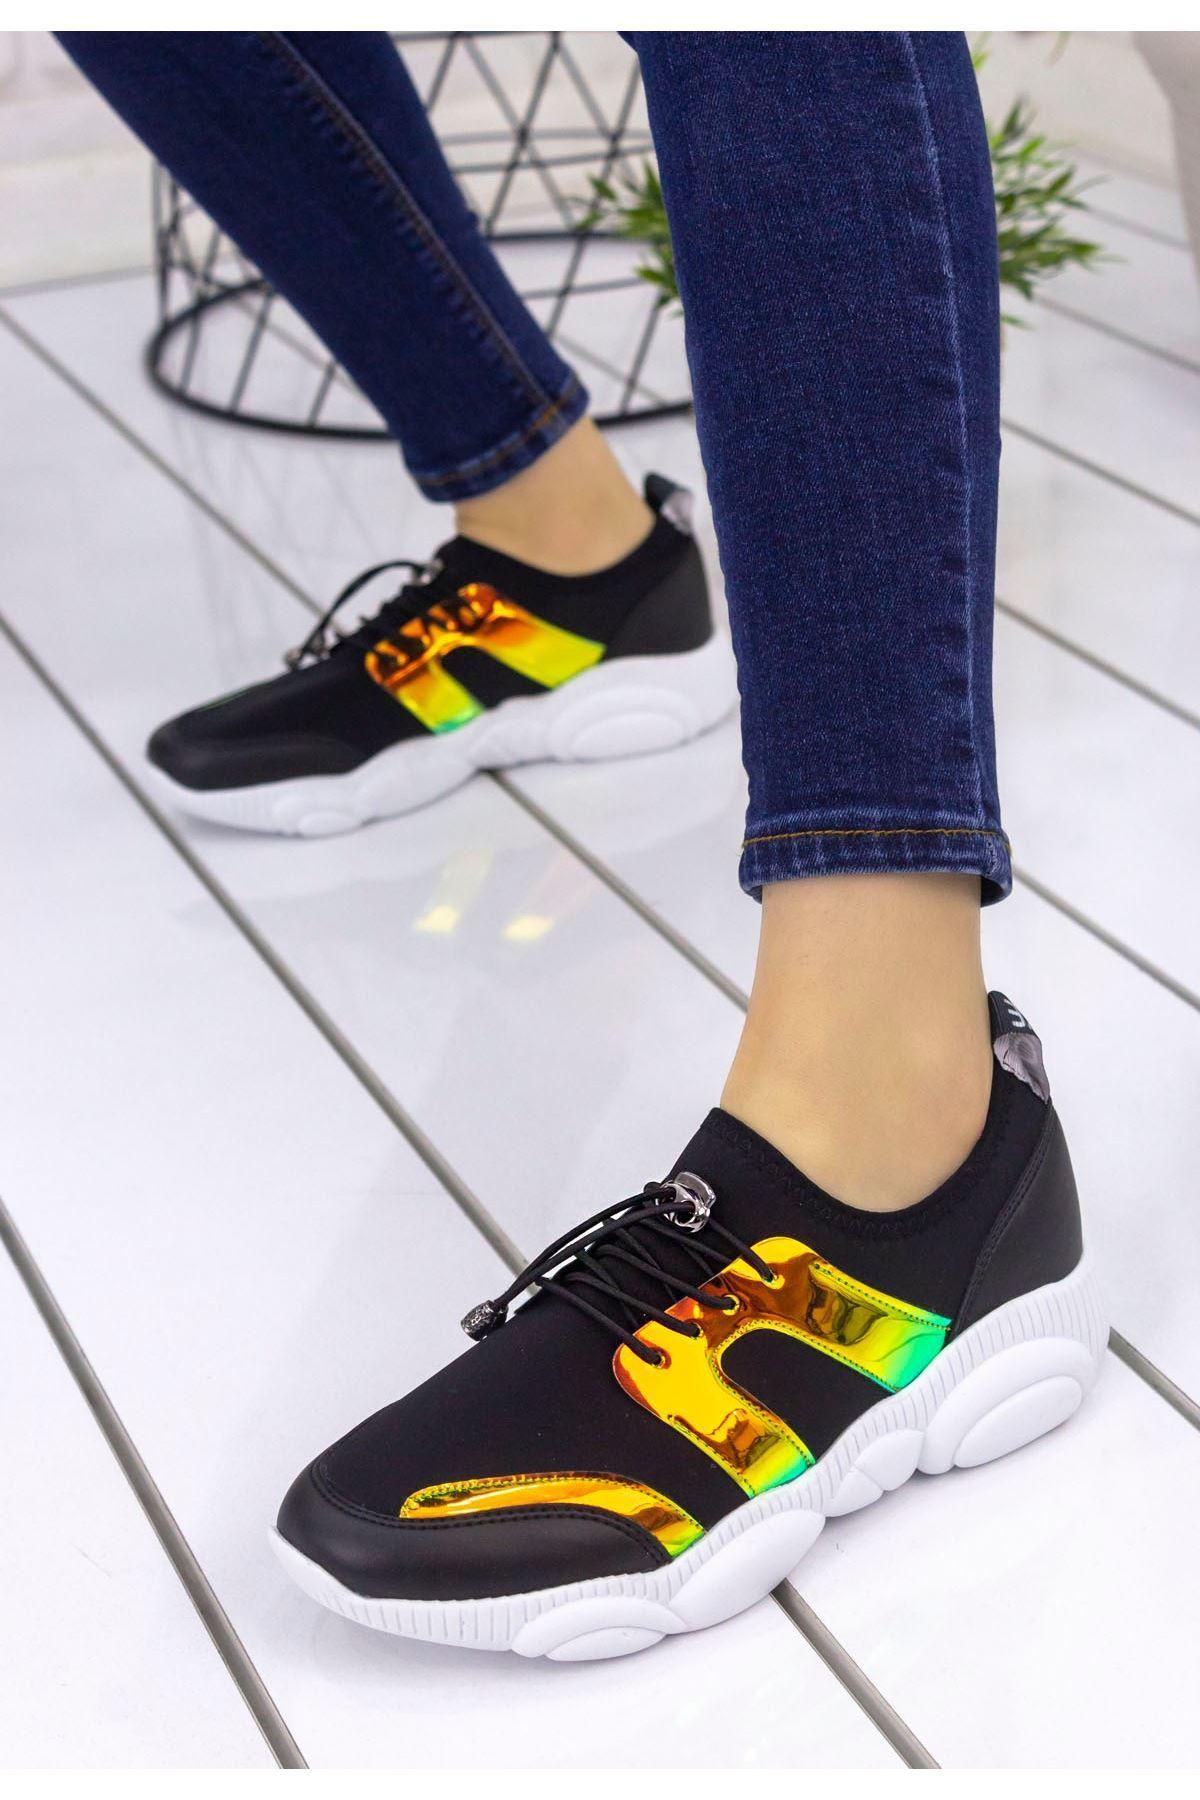 Neoma Siyah Cilt Hologramlı Spor Ayakkabı